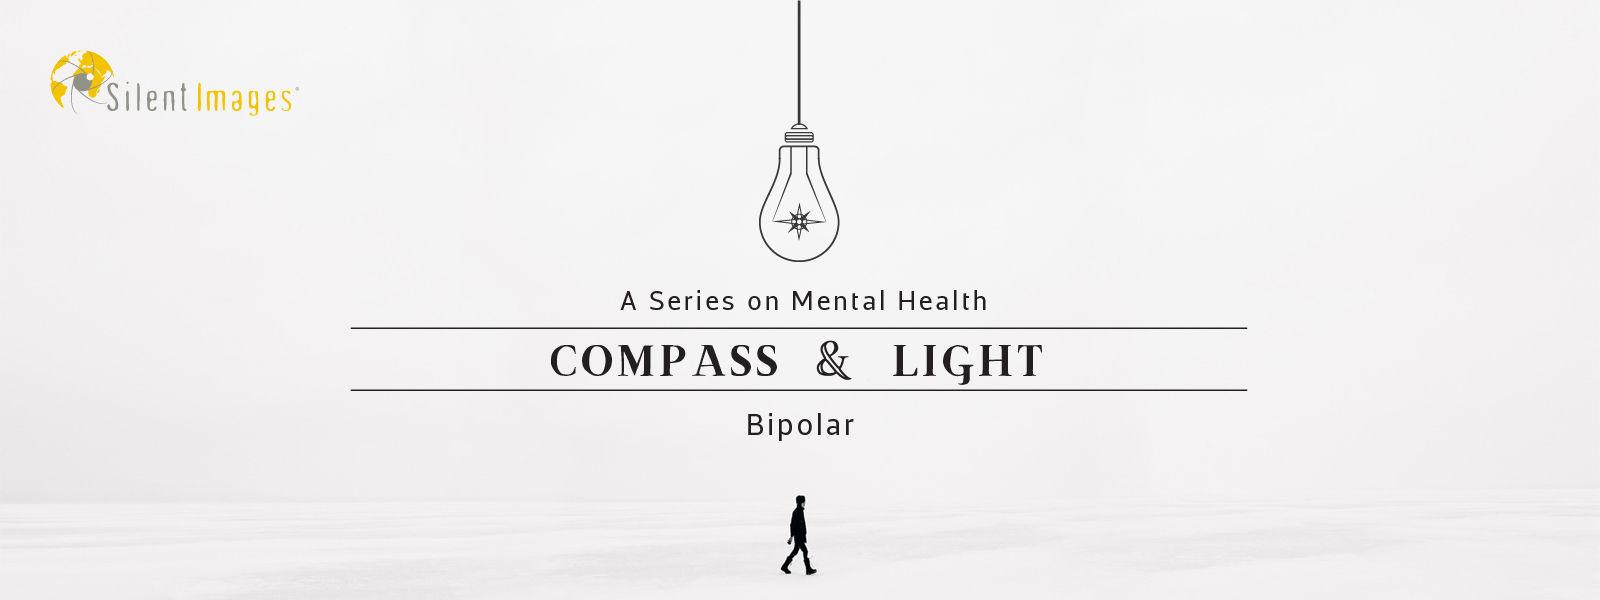 Bipolar: A Compass & Light Study